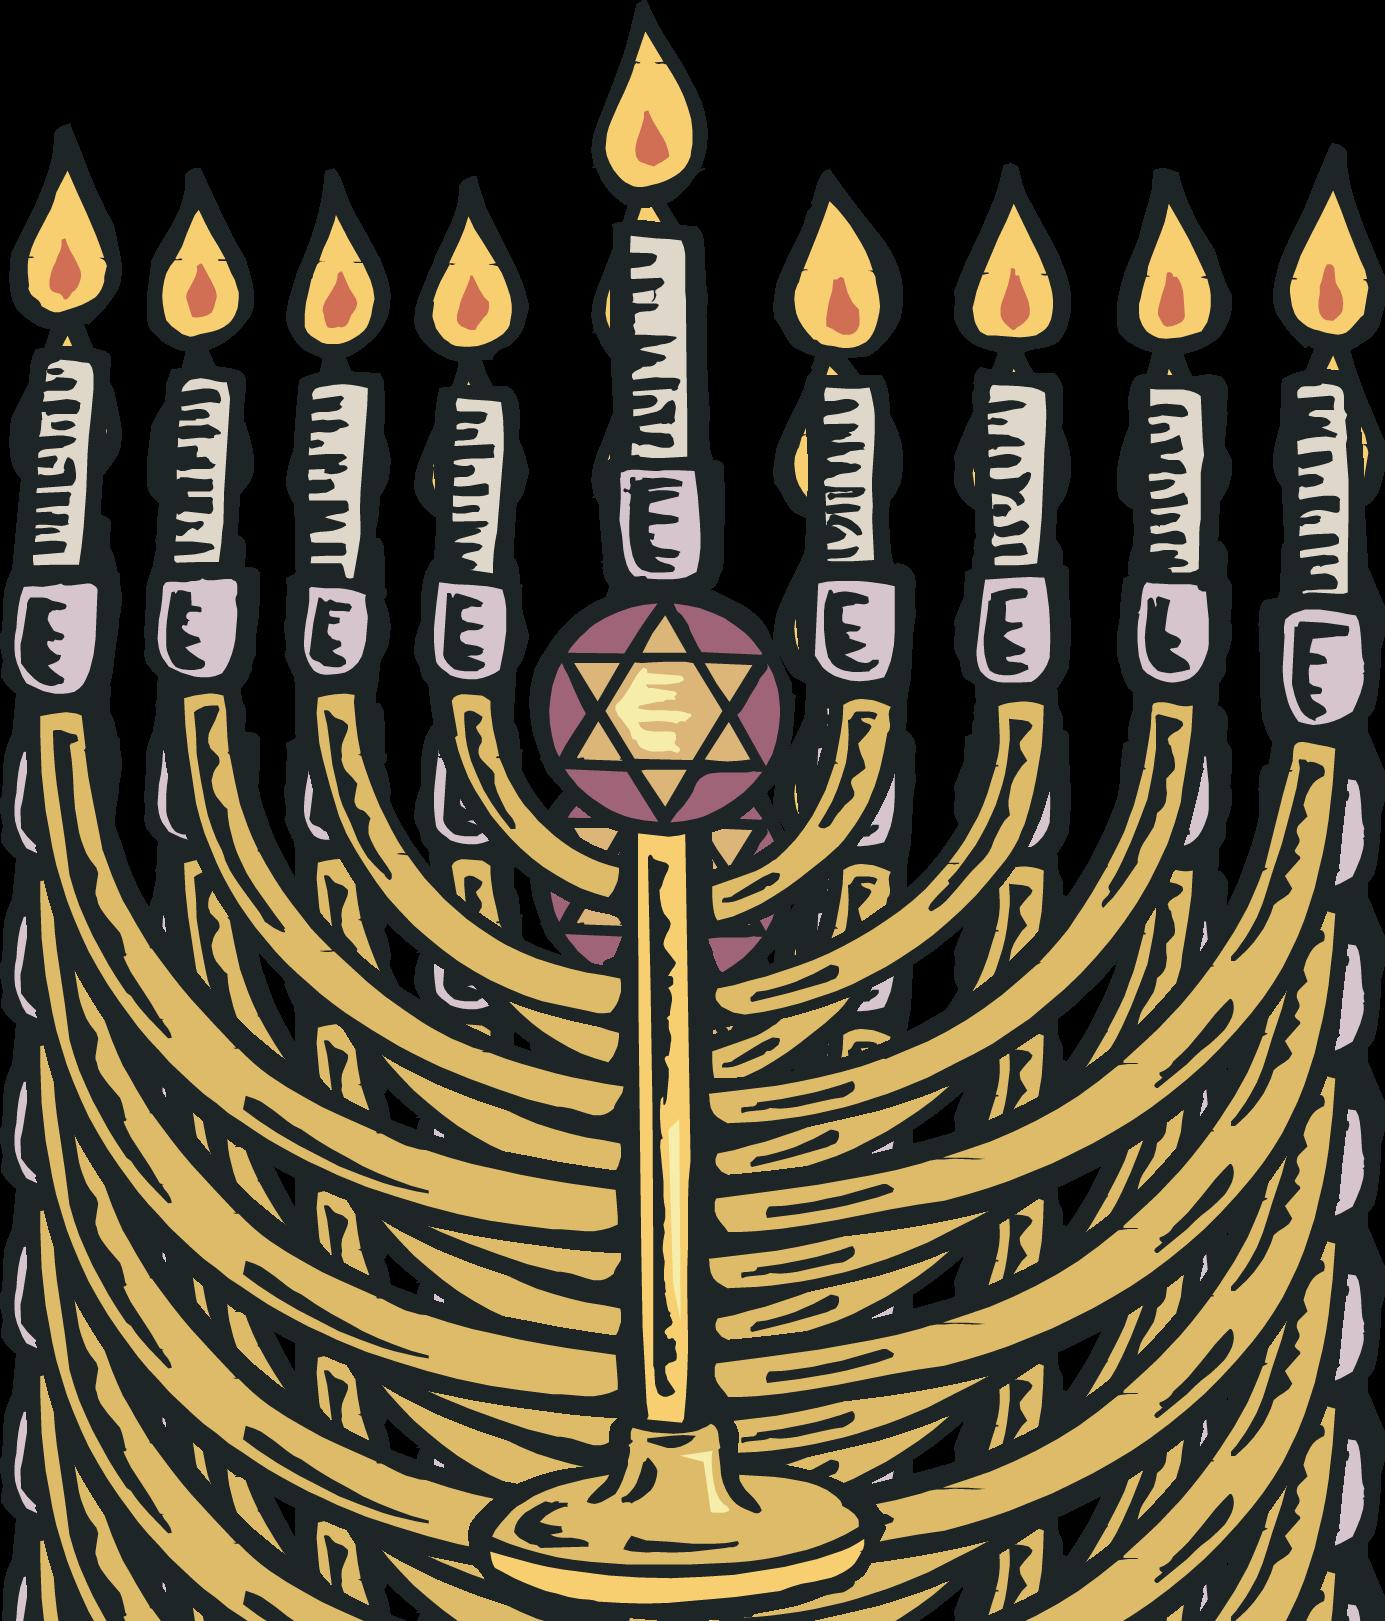 Menorah clipart judaism. Free images of hanukkah